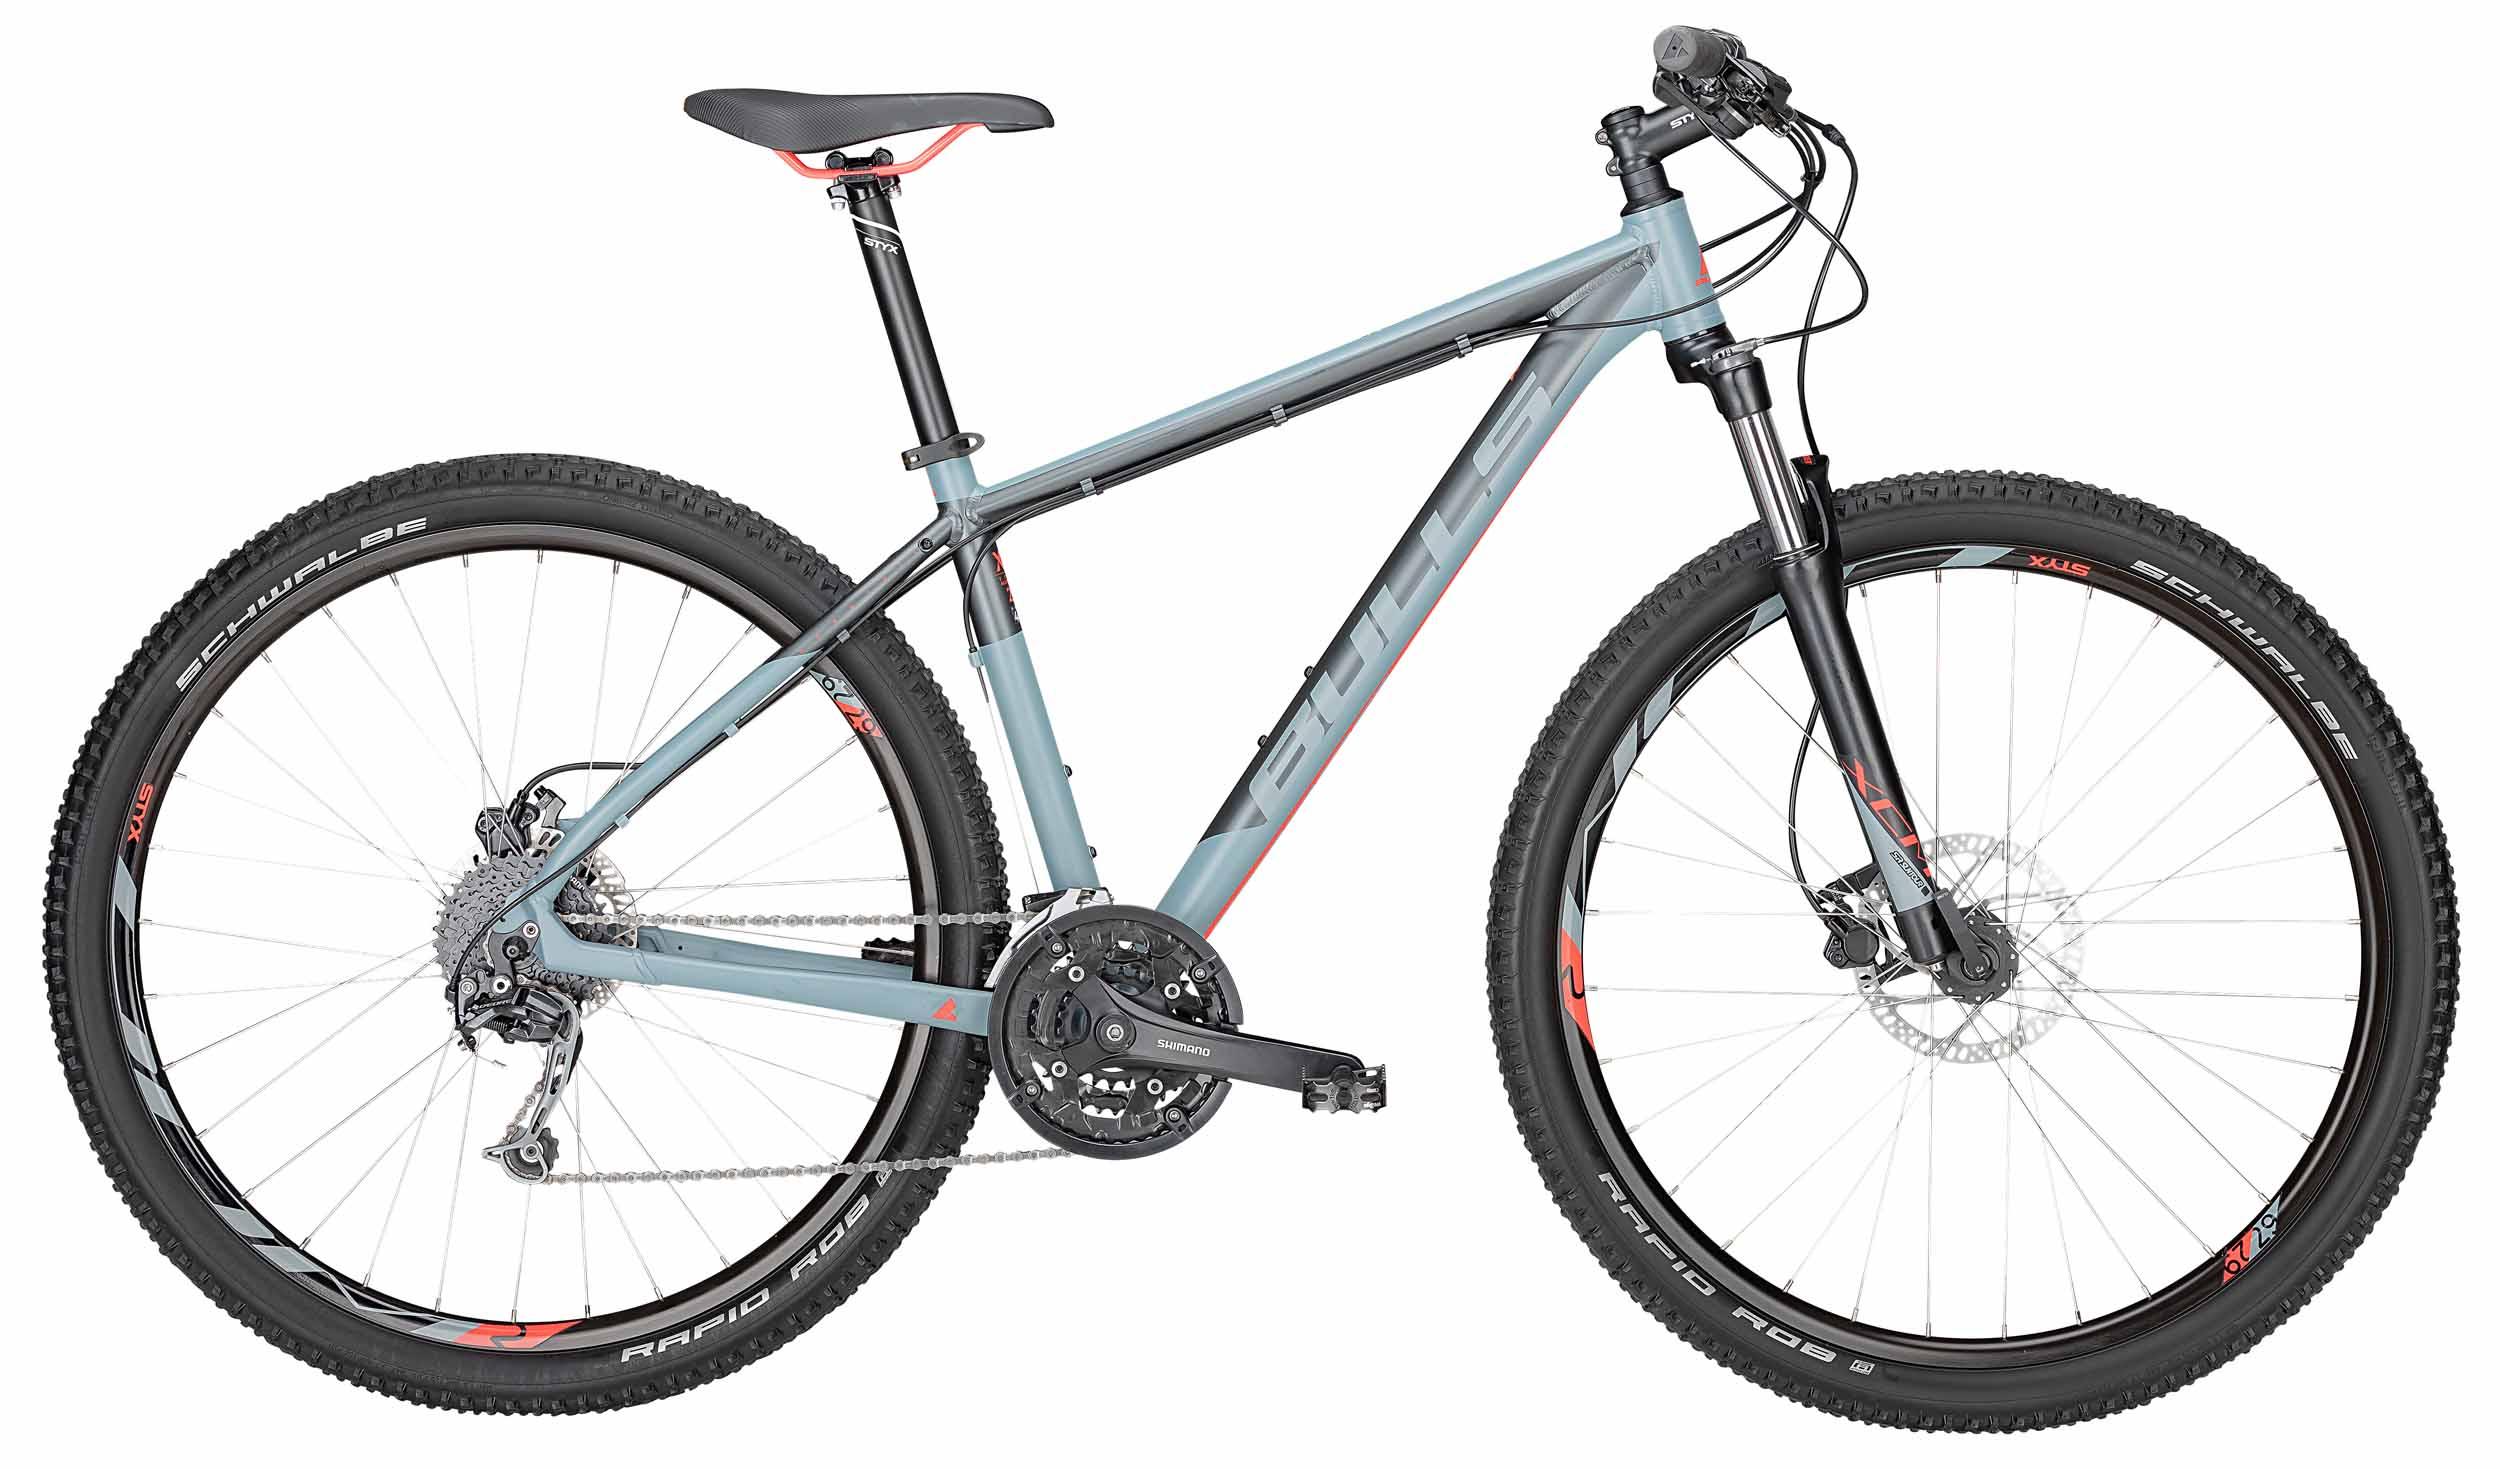 bulls mountain bikes ronald schot d elektrische. Black Bedroom Furniture Sets. Home Design Ideas